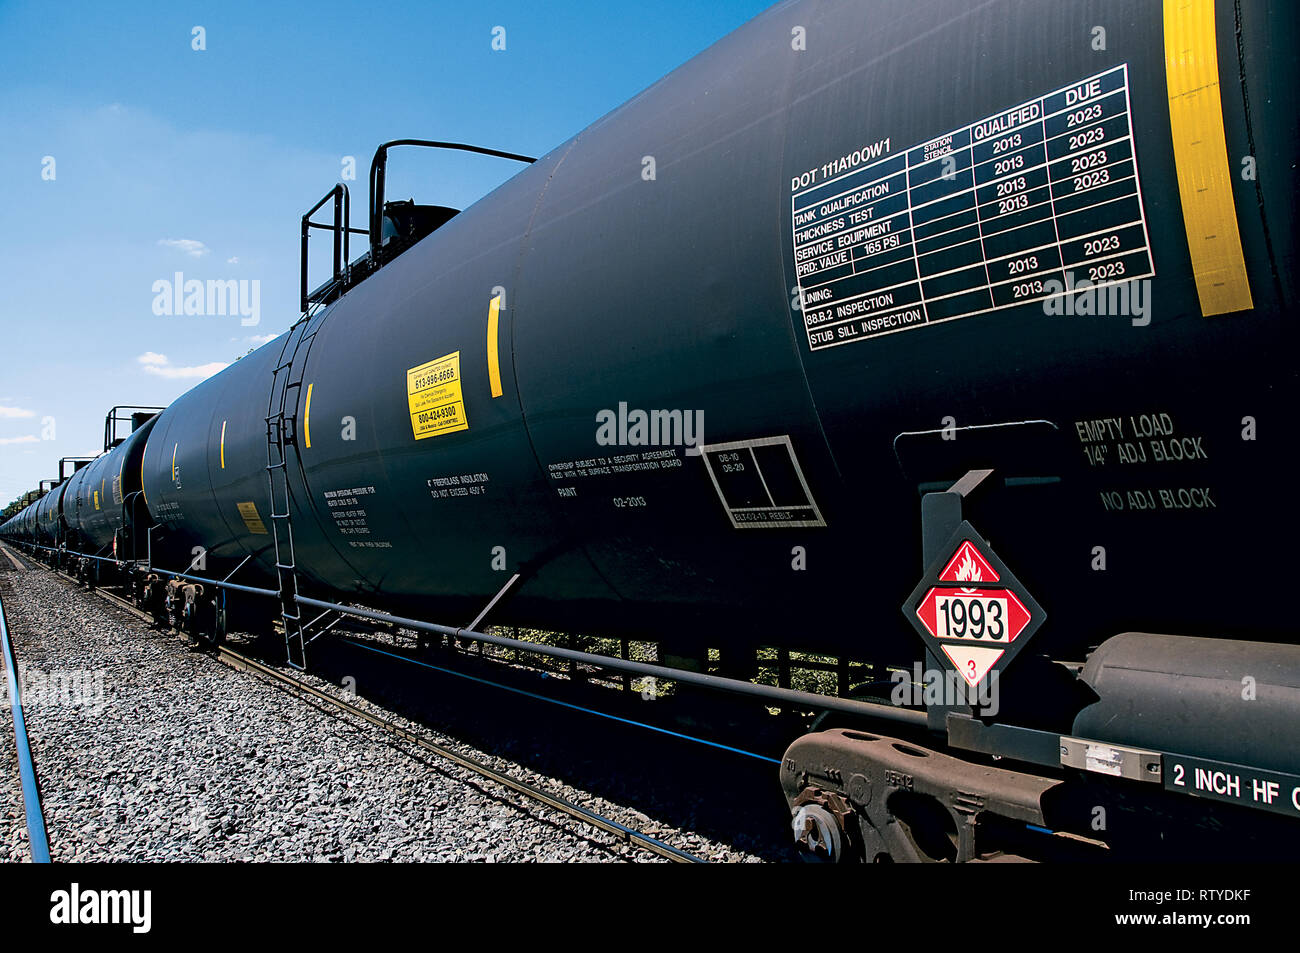 Hazardous Materials Tank Cars on Train - Stock Image